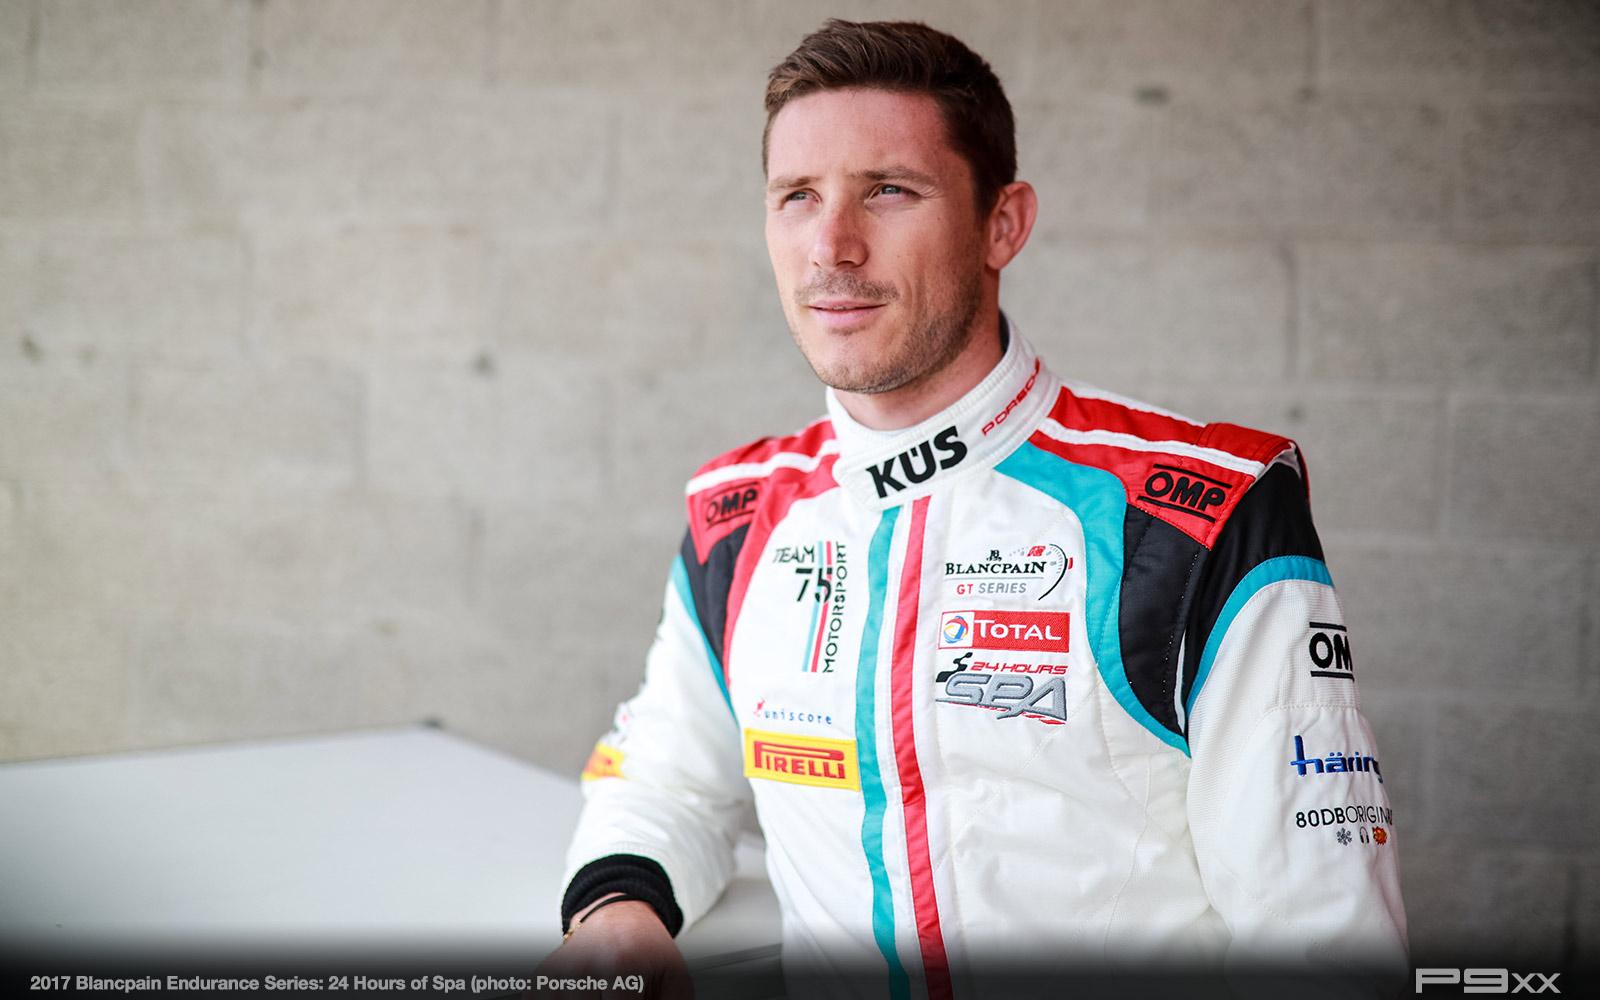 2017-24-Hours-of-Spa-Porsche-292